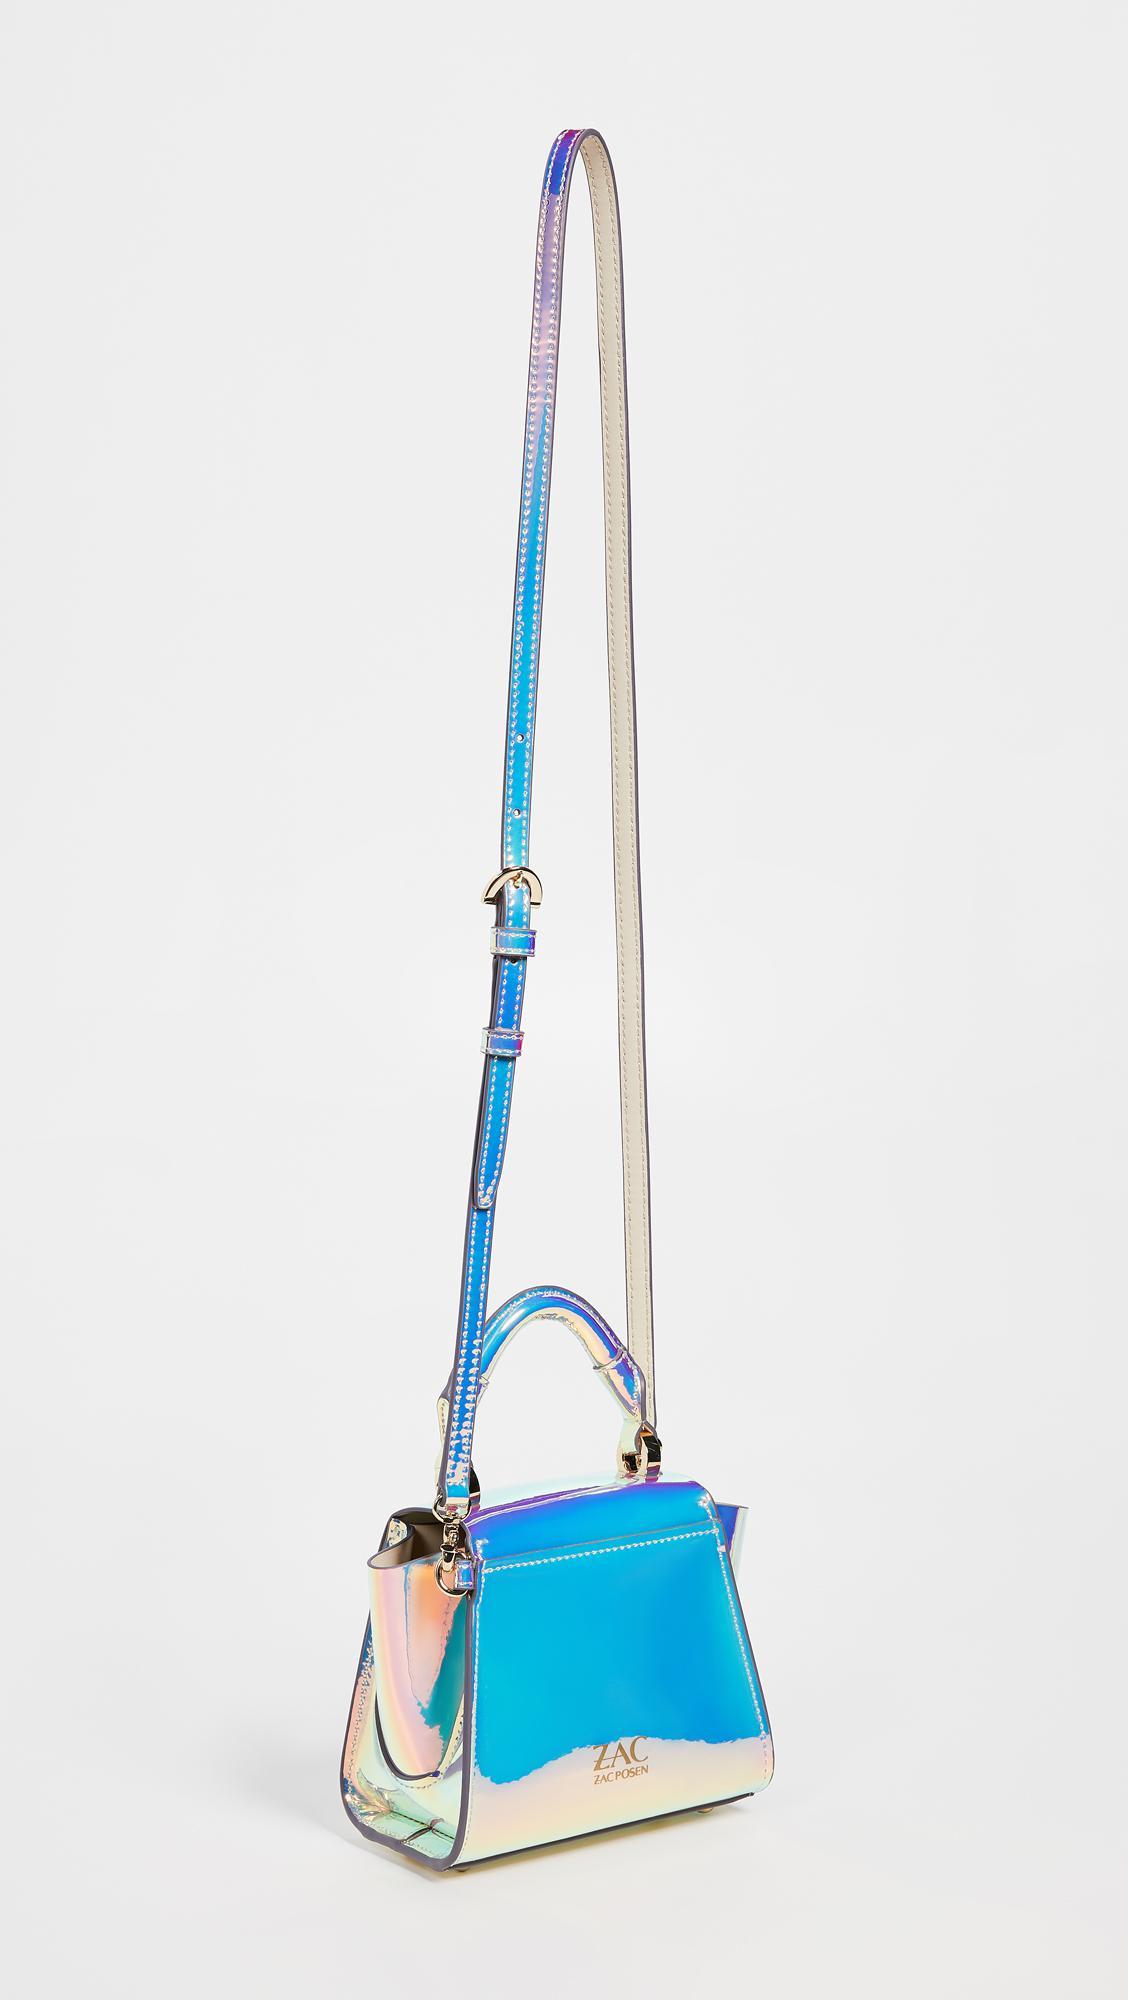 Zac Zac Posen Eartha Iridescent Mini Top Handle Bag In